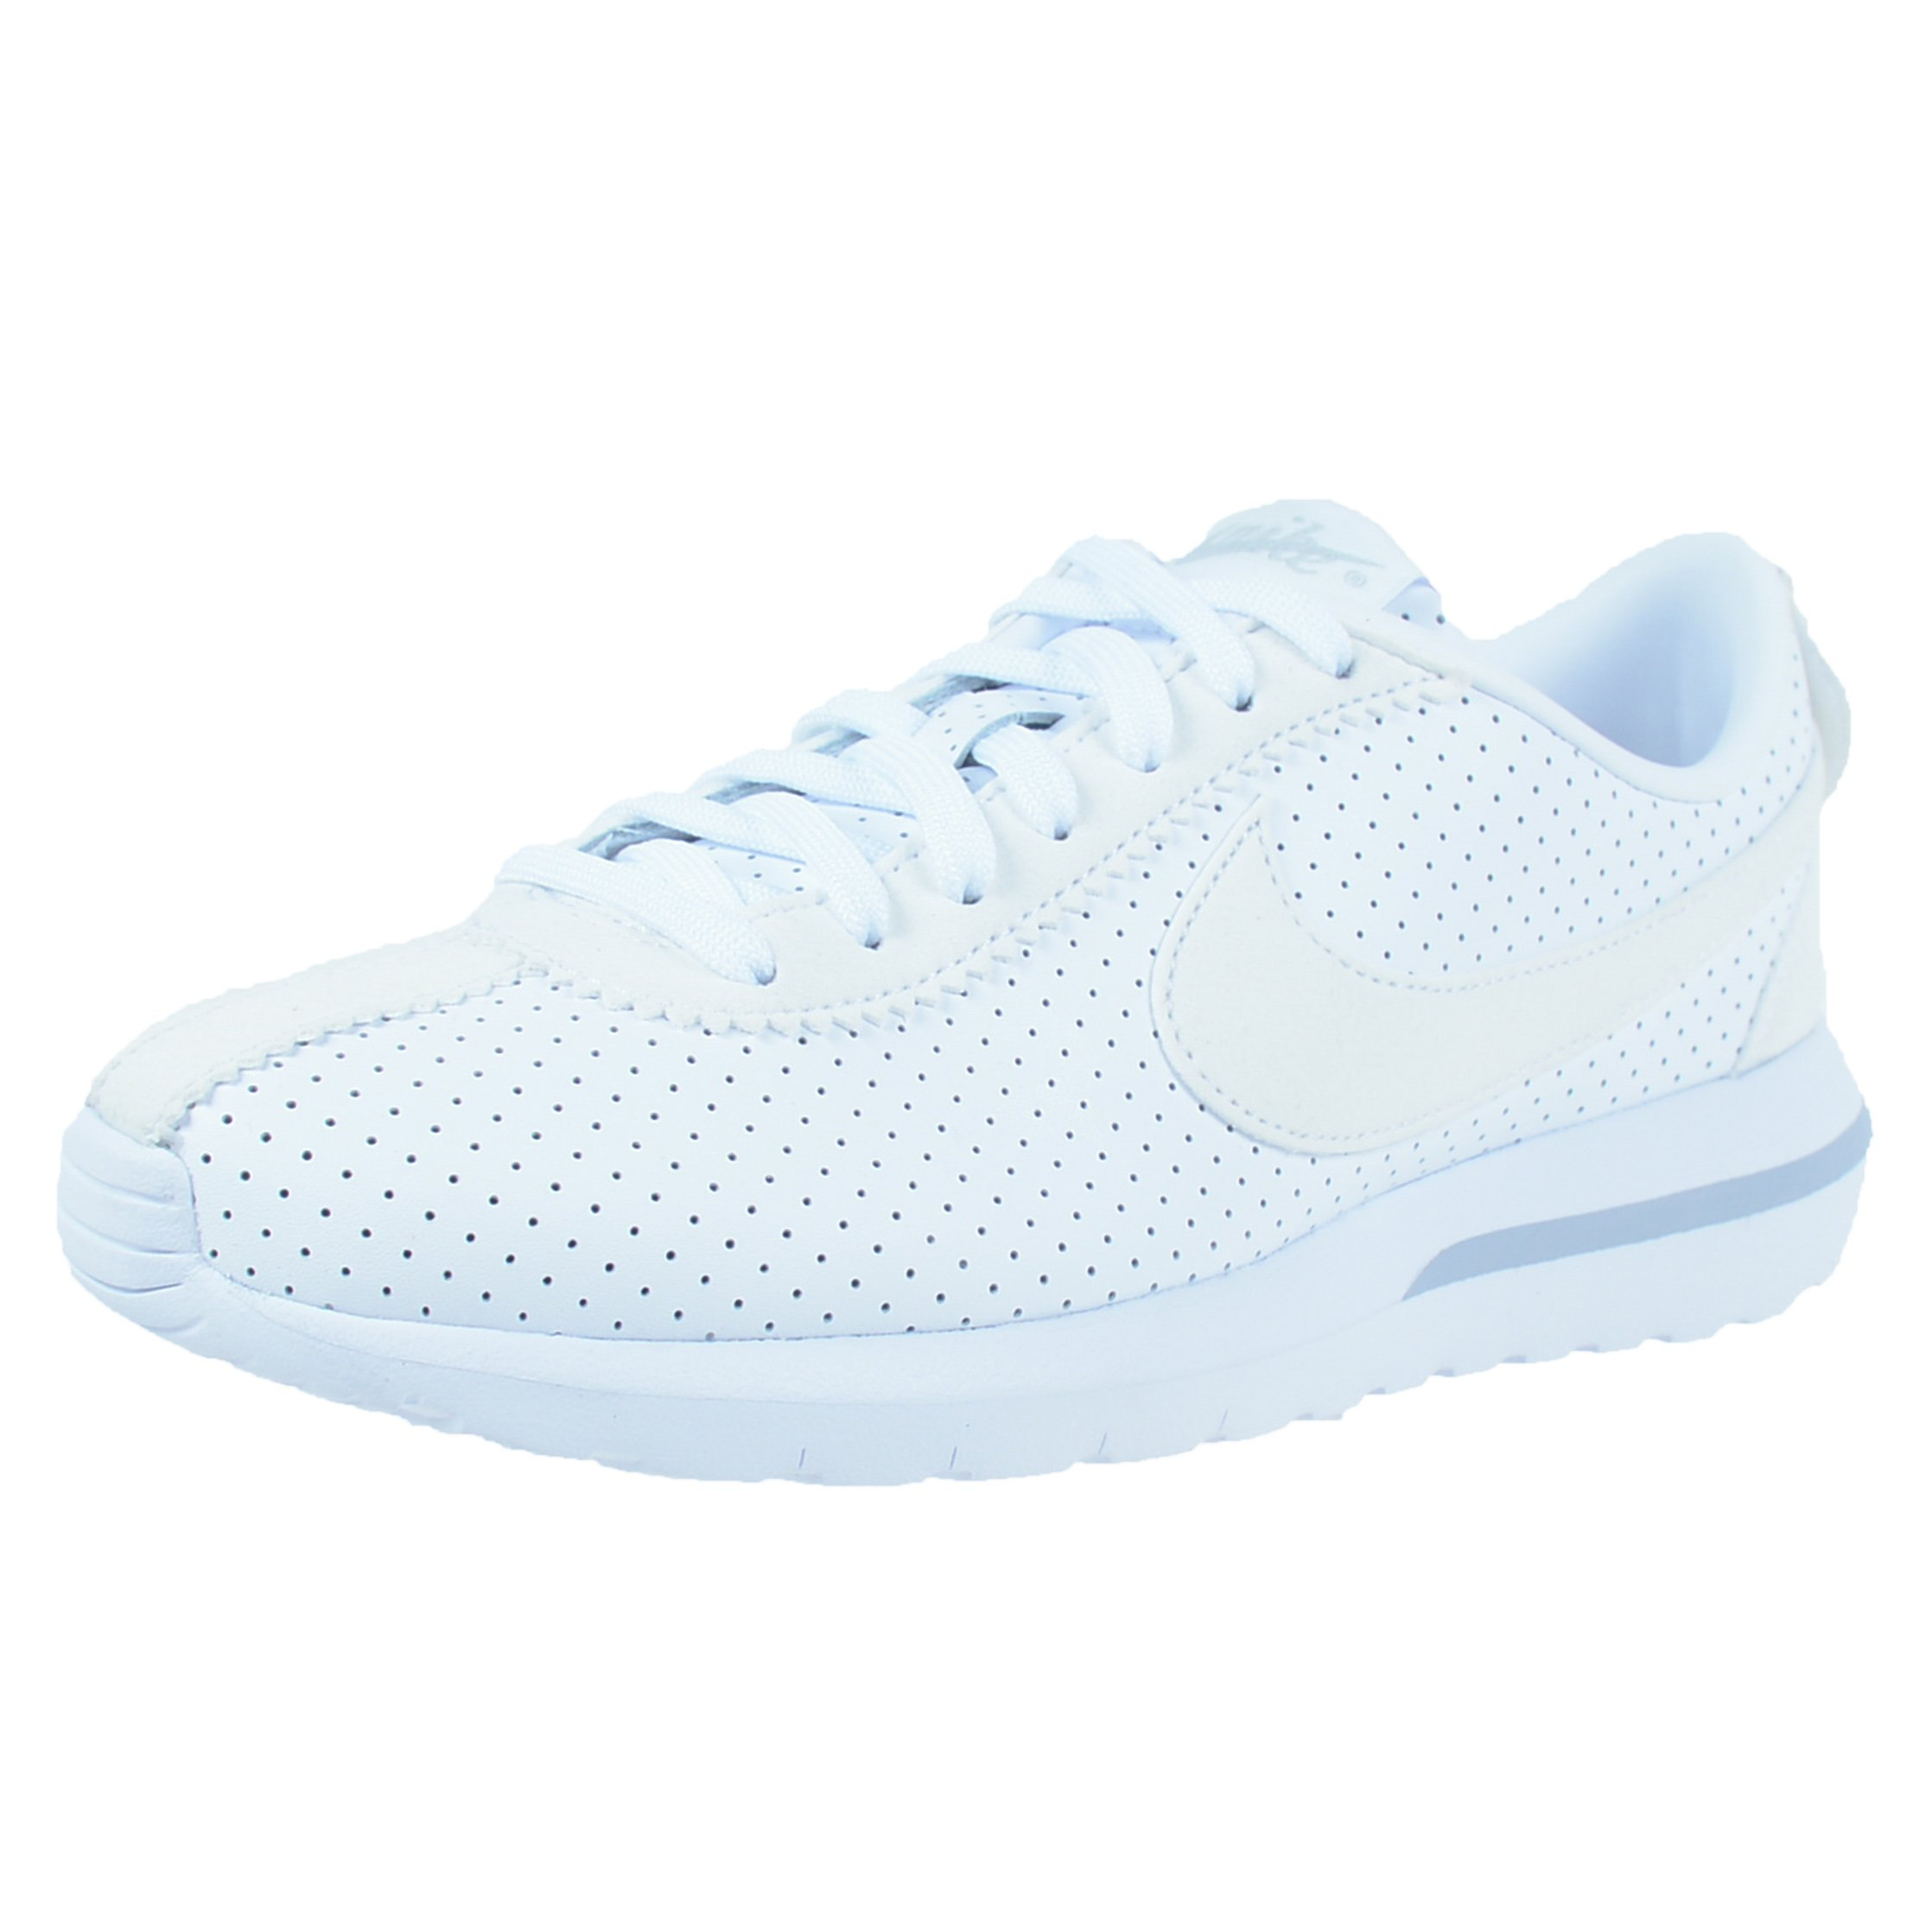 Nike - W Roshe Cortez NM - Farbe: Weiß - Größe: 36.5